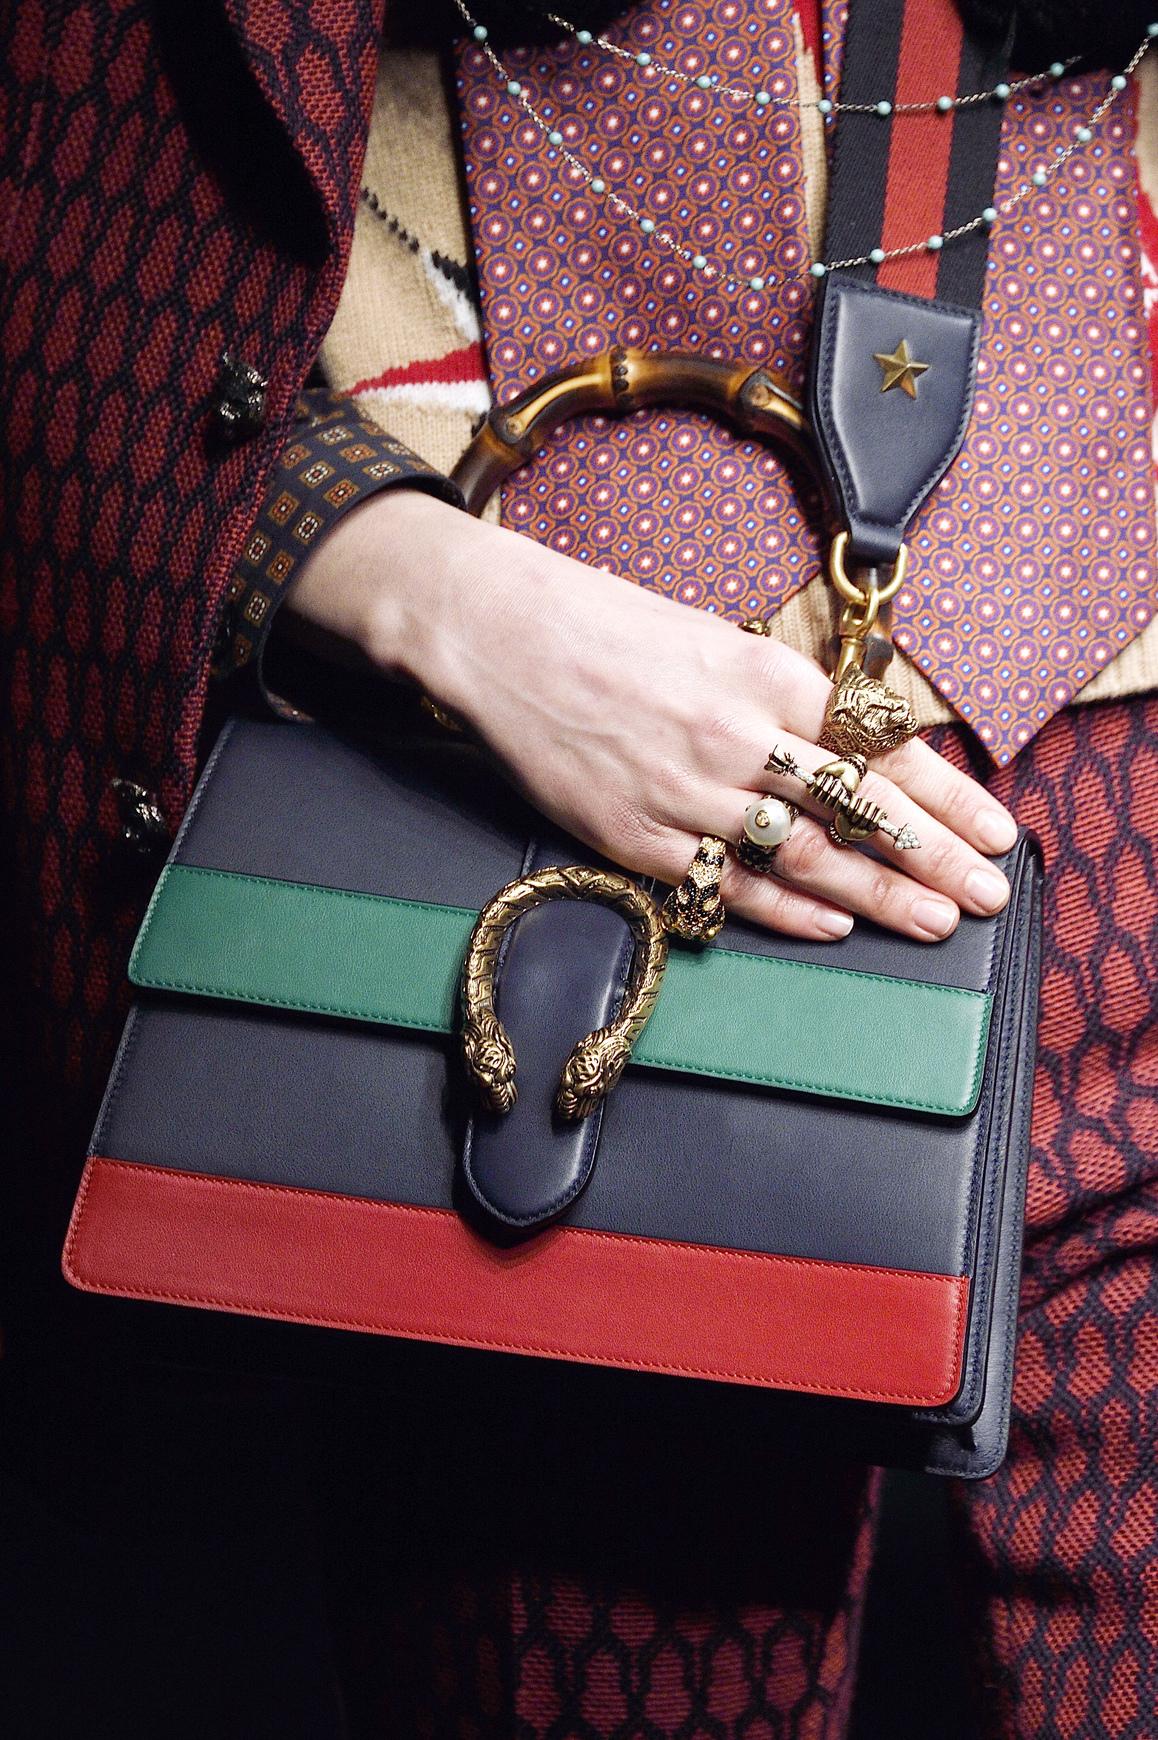 Трендовые сумки зима 2017: как носить модно и с чем